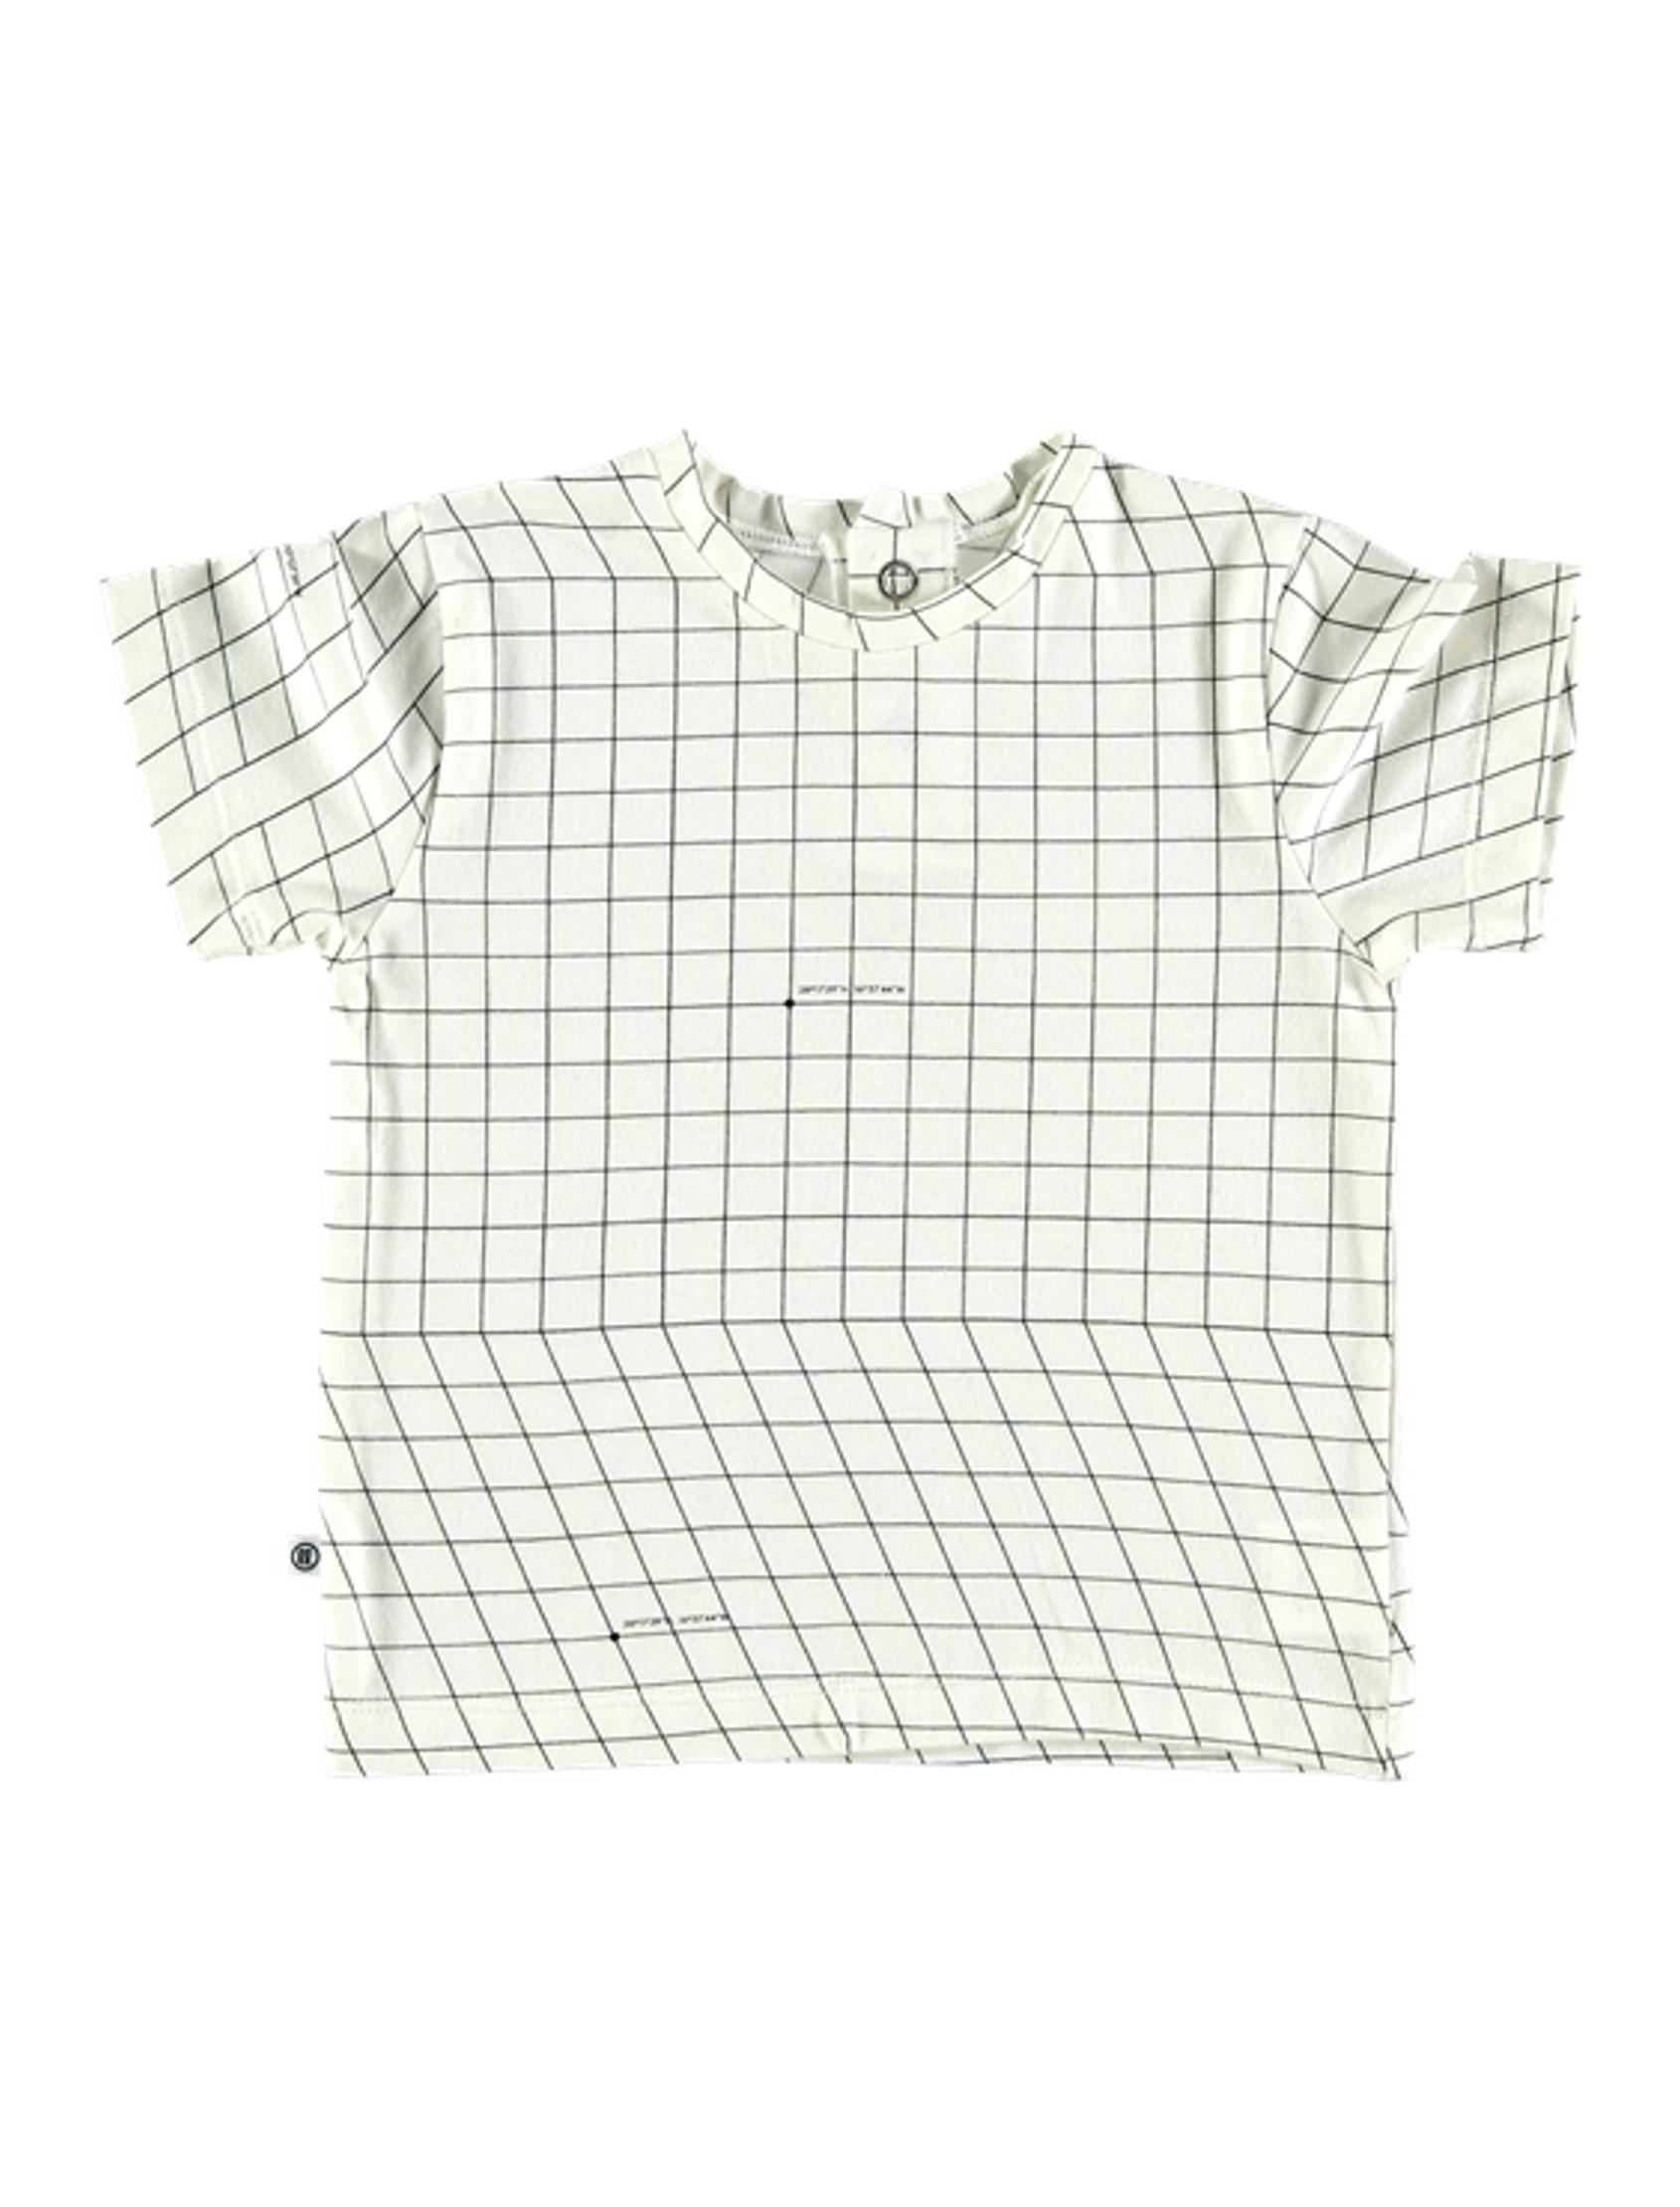 Camiseta coordenadas LLana_01